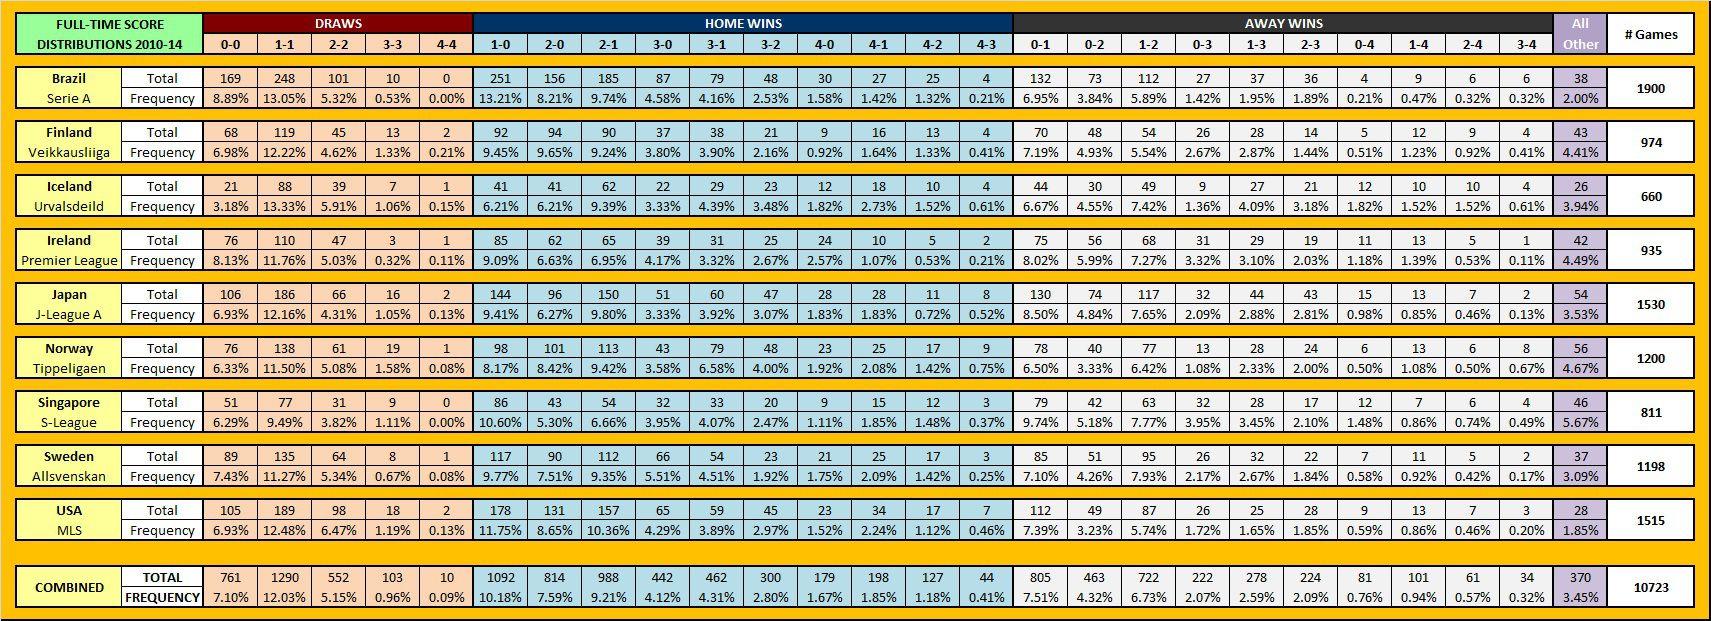 28_FT-Score-Distributions